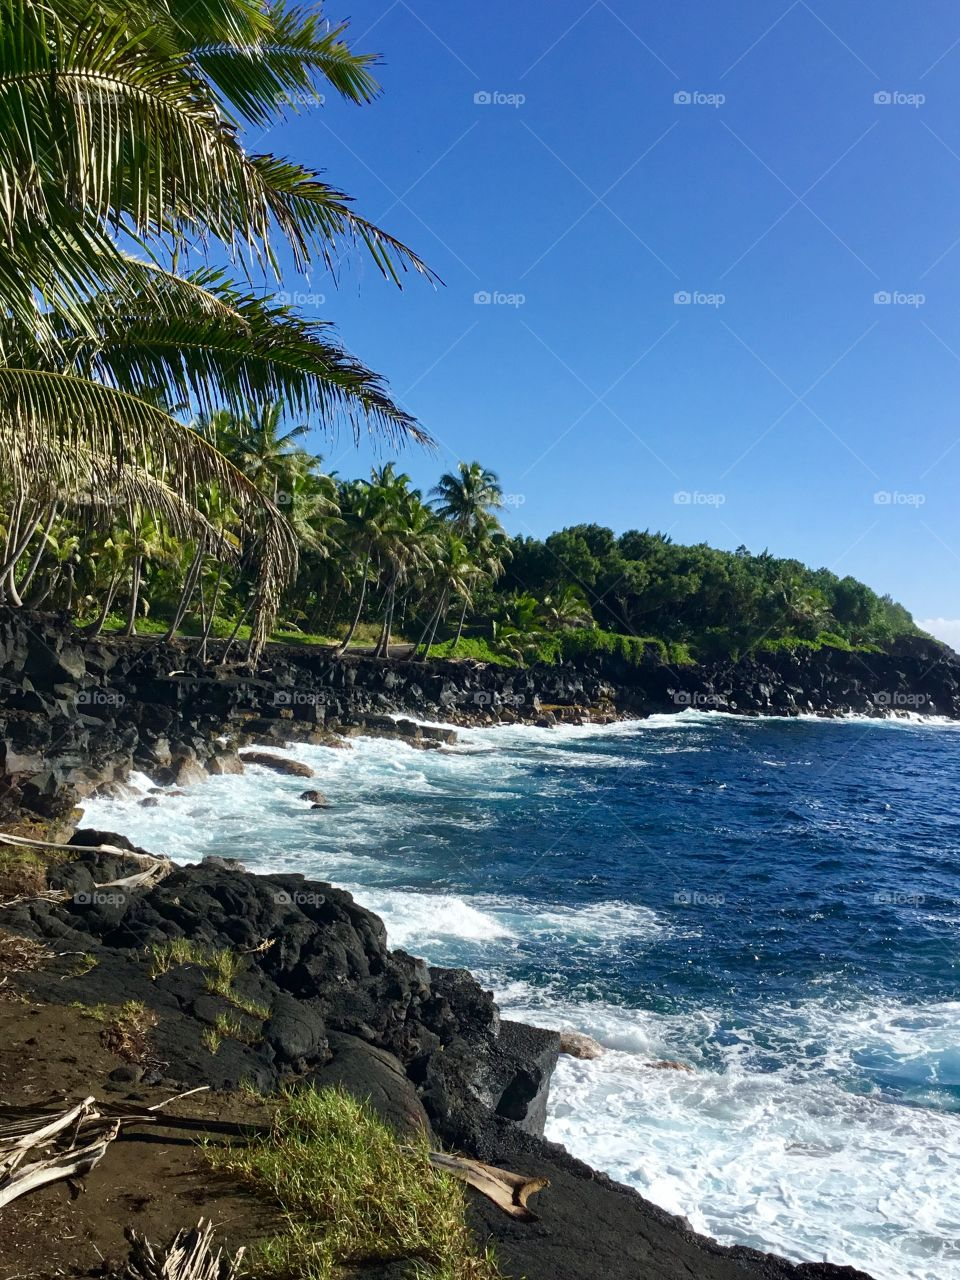 Sunny blue day on the ocean